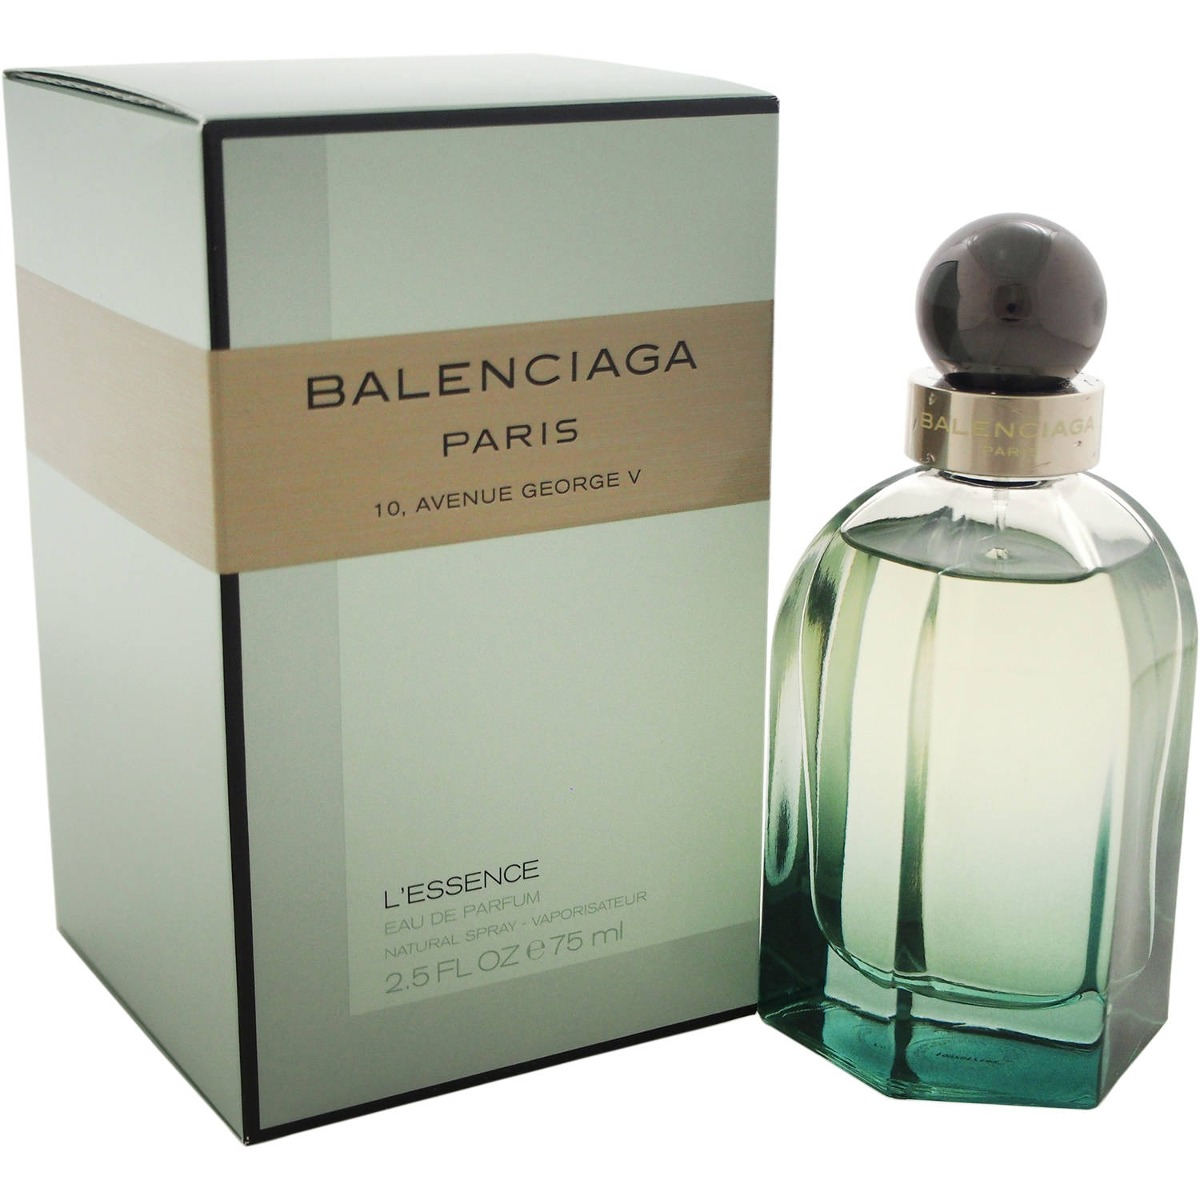 Spray Mujer Balenciaga Paris Parfum Eau De L'essence Para QrdoEeWCBx